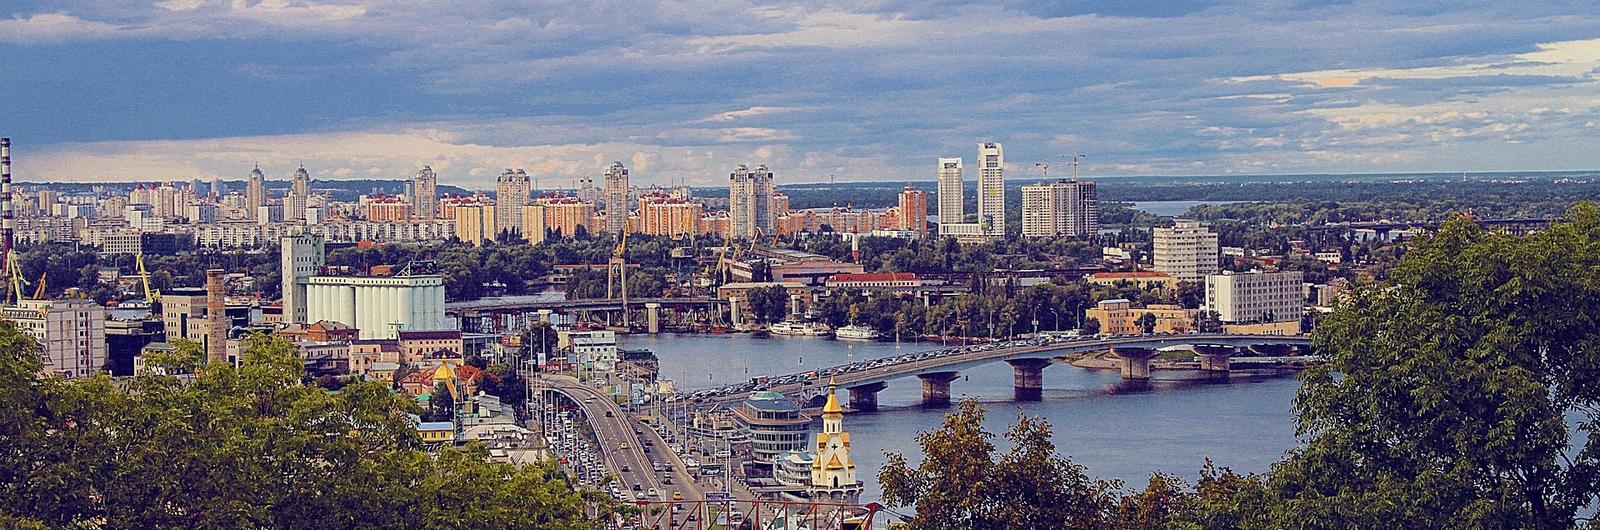 kiev city header